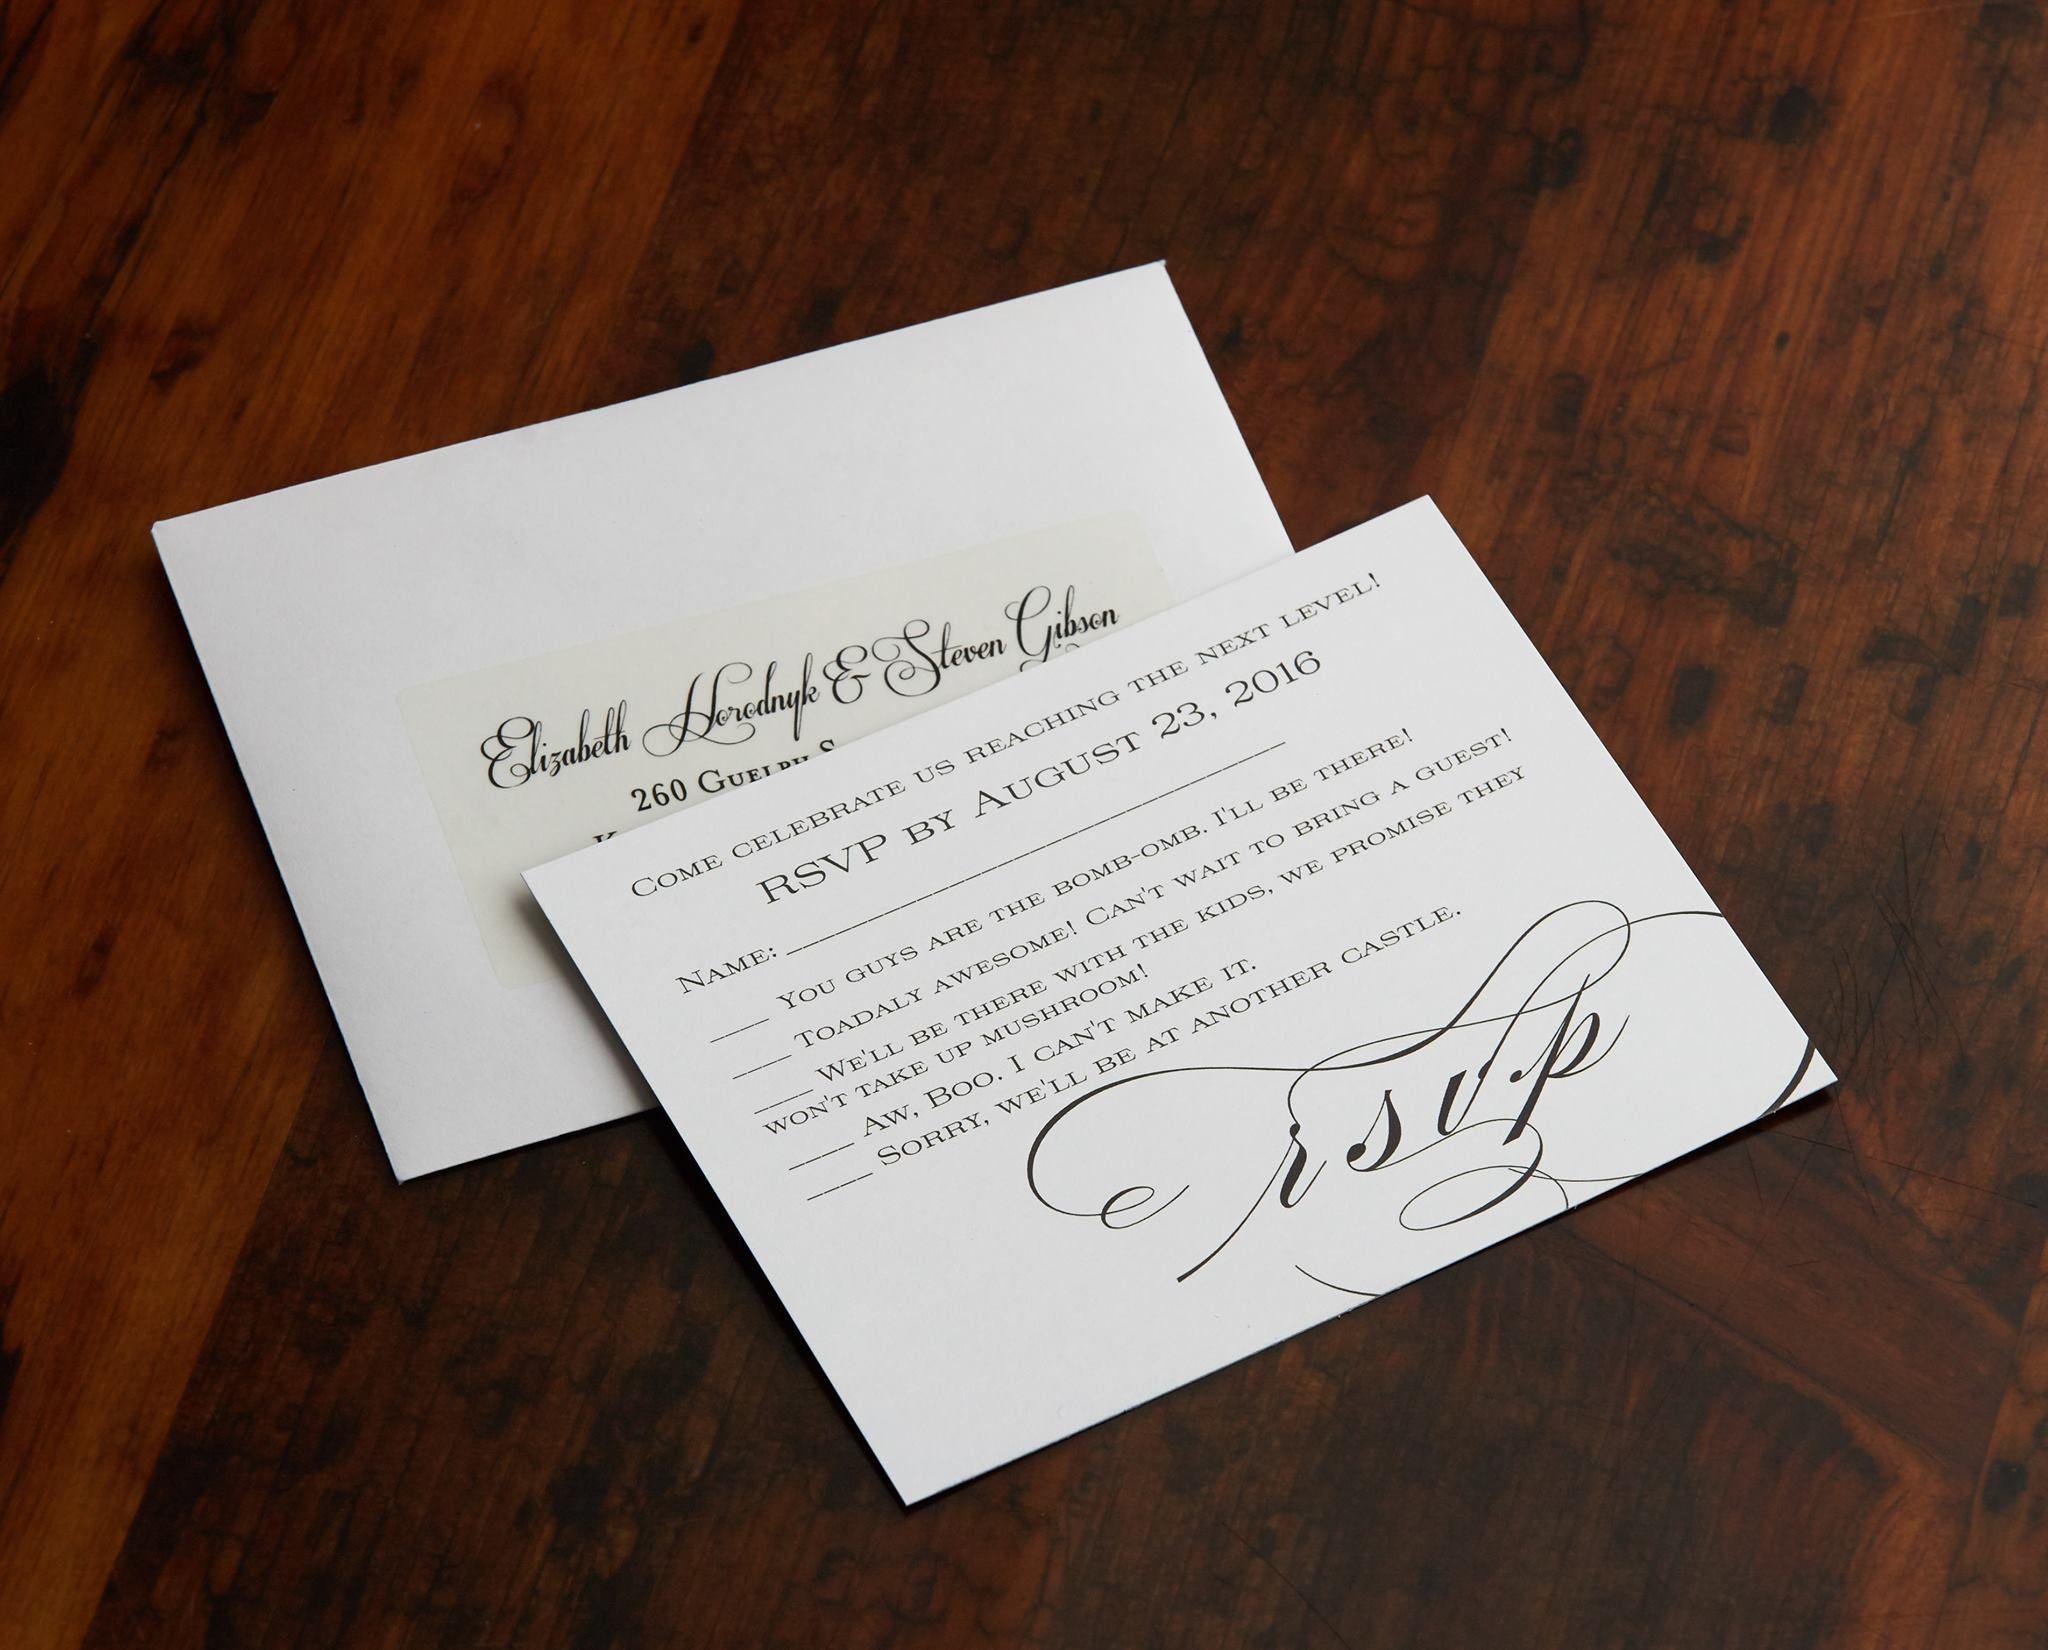 wedding invitation rsvp wording funny%0A Geeky RSVP Card  Nintendo Themed Wedding  Puns  Invitations  Wedding  Geek